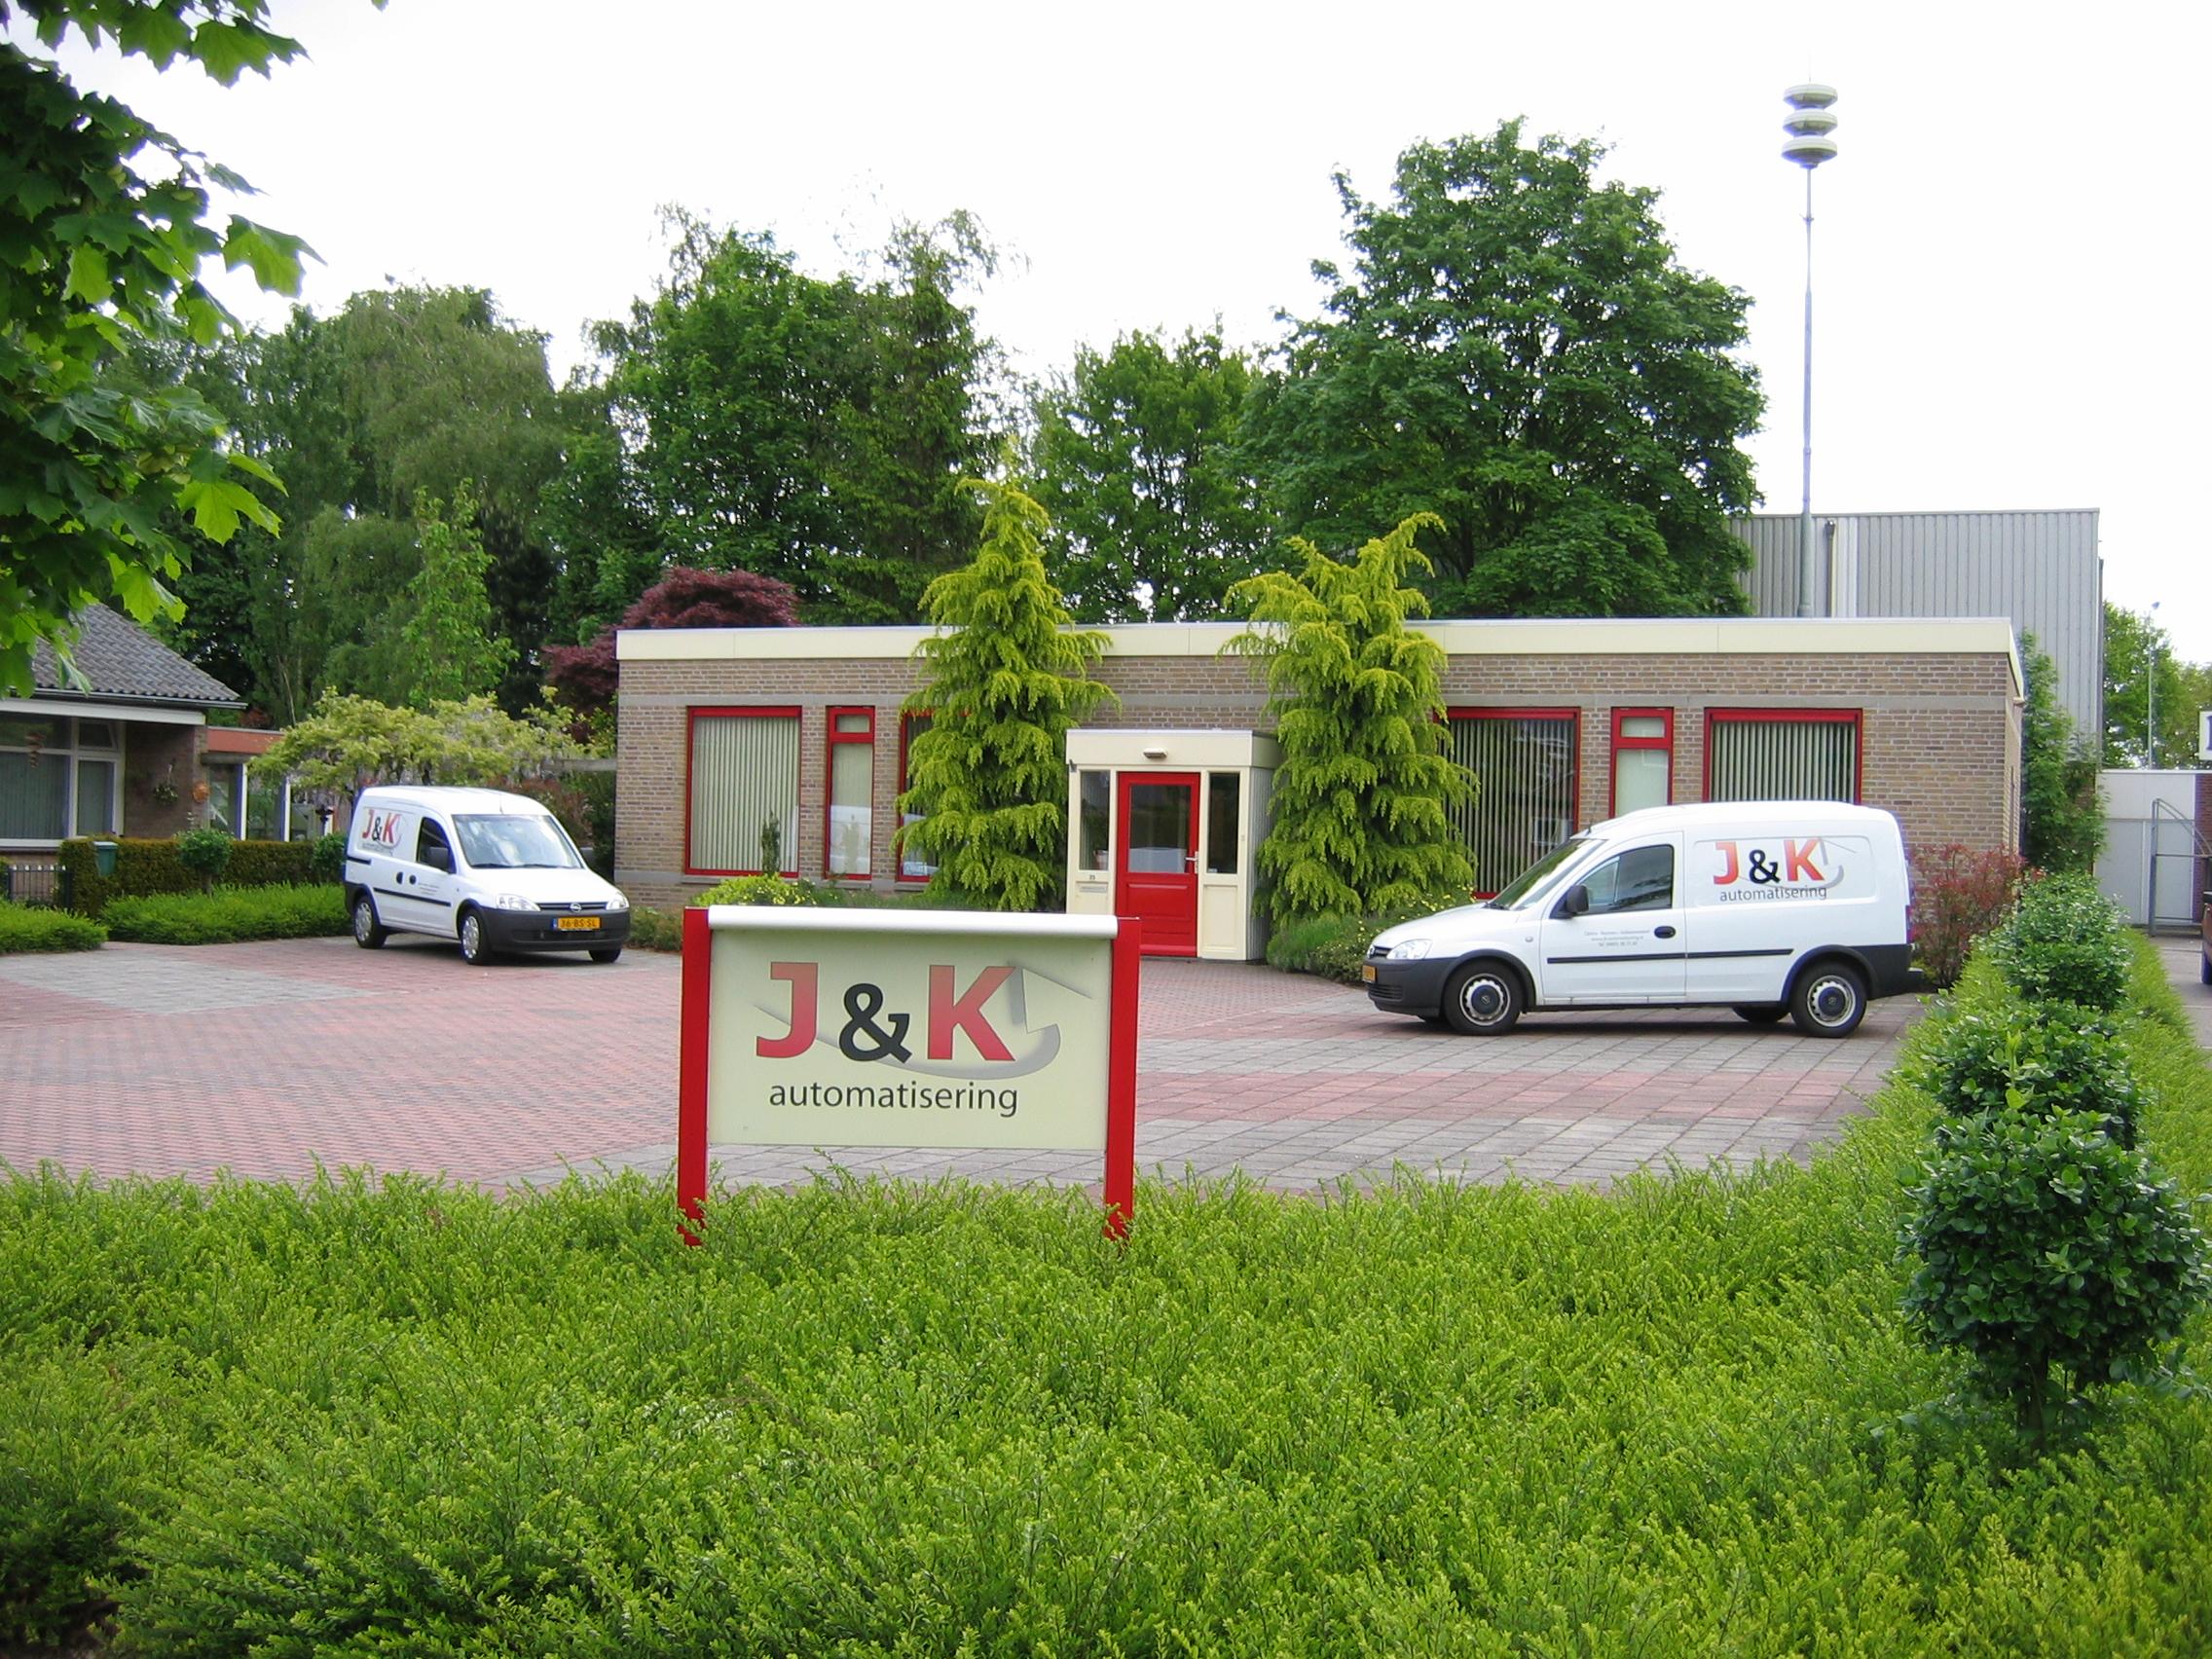 Kantoorpand J&K Automatisering